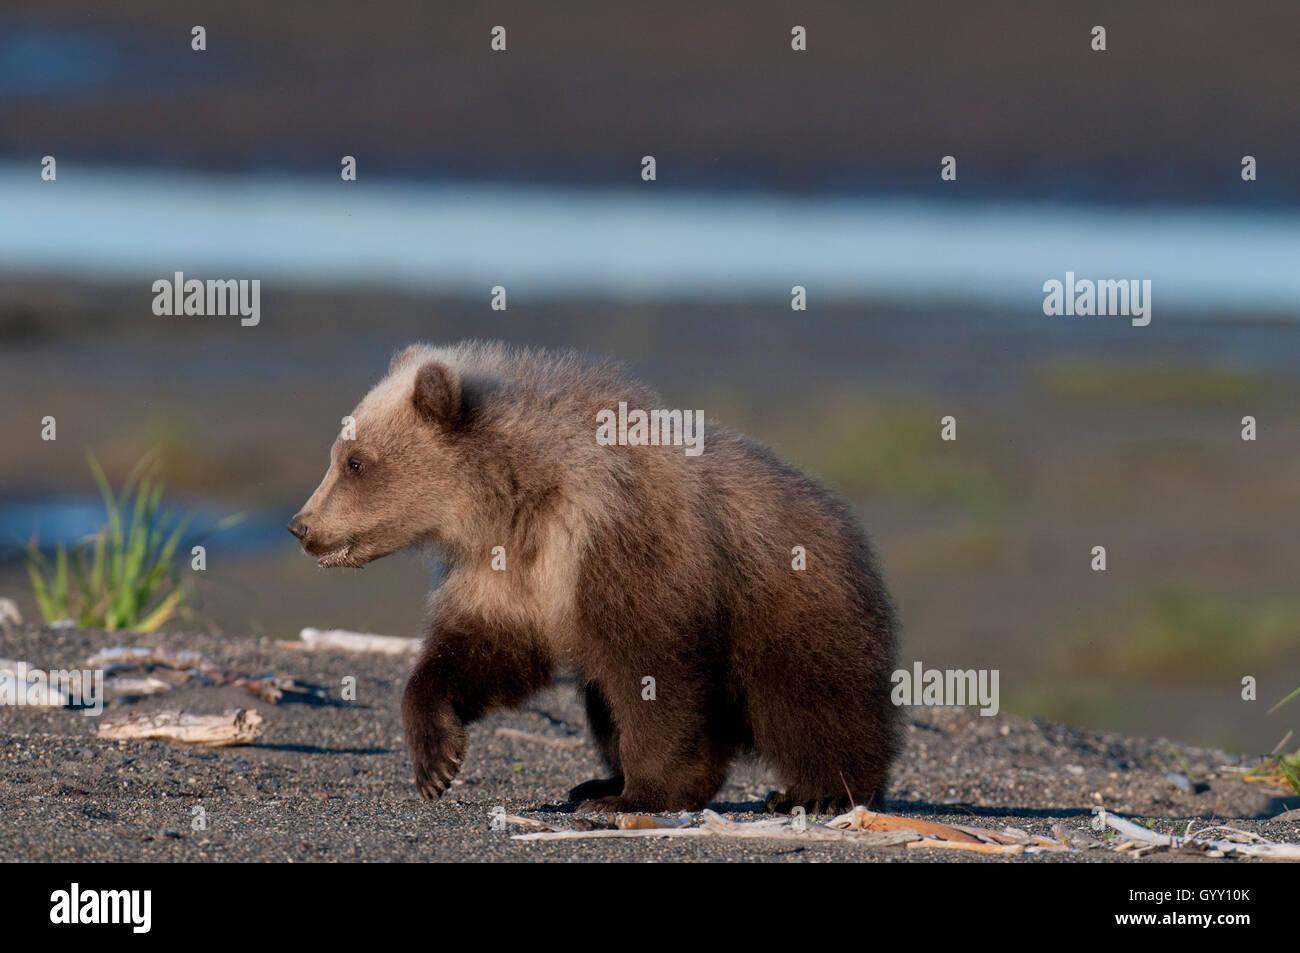 Brown bear cub (Ursus arctos) walking on beach in Lake Clark National Park, Alaska - Stock Image